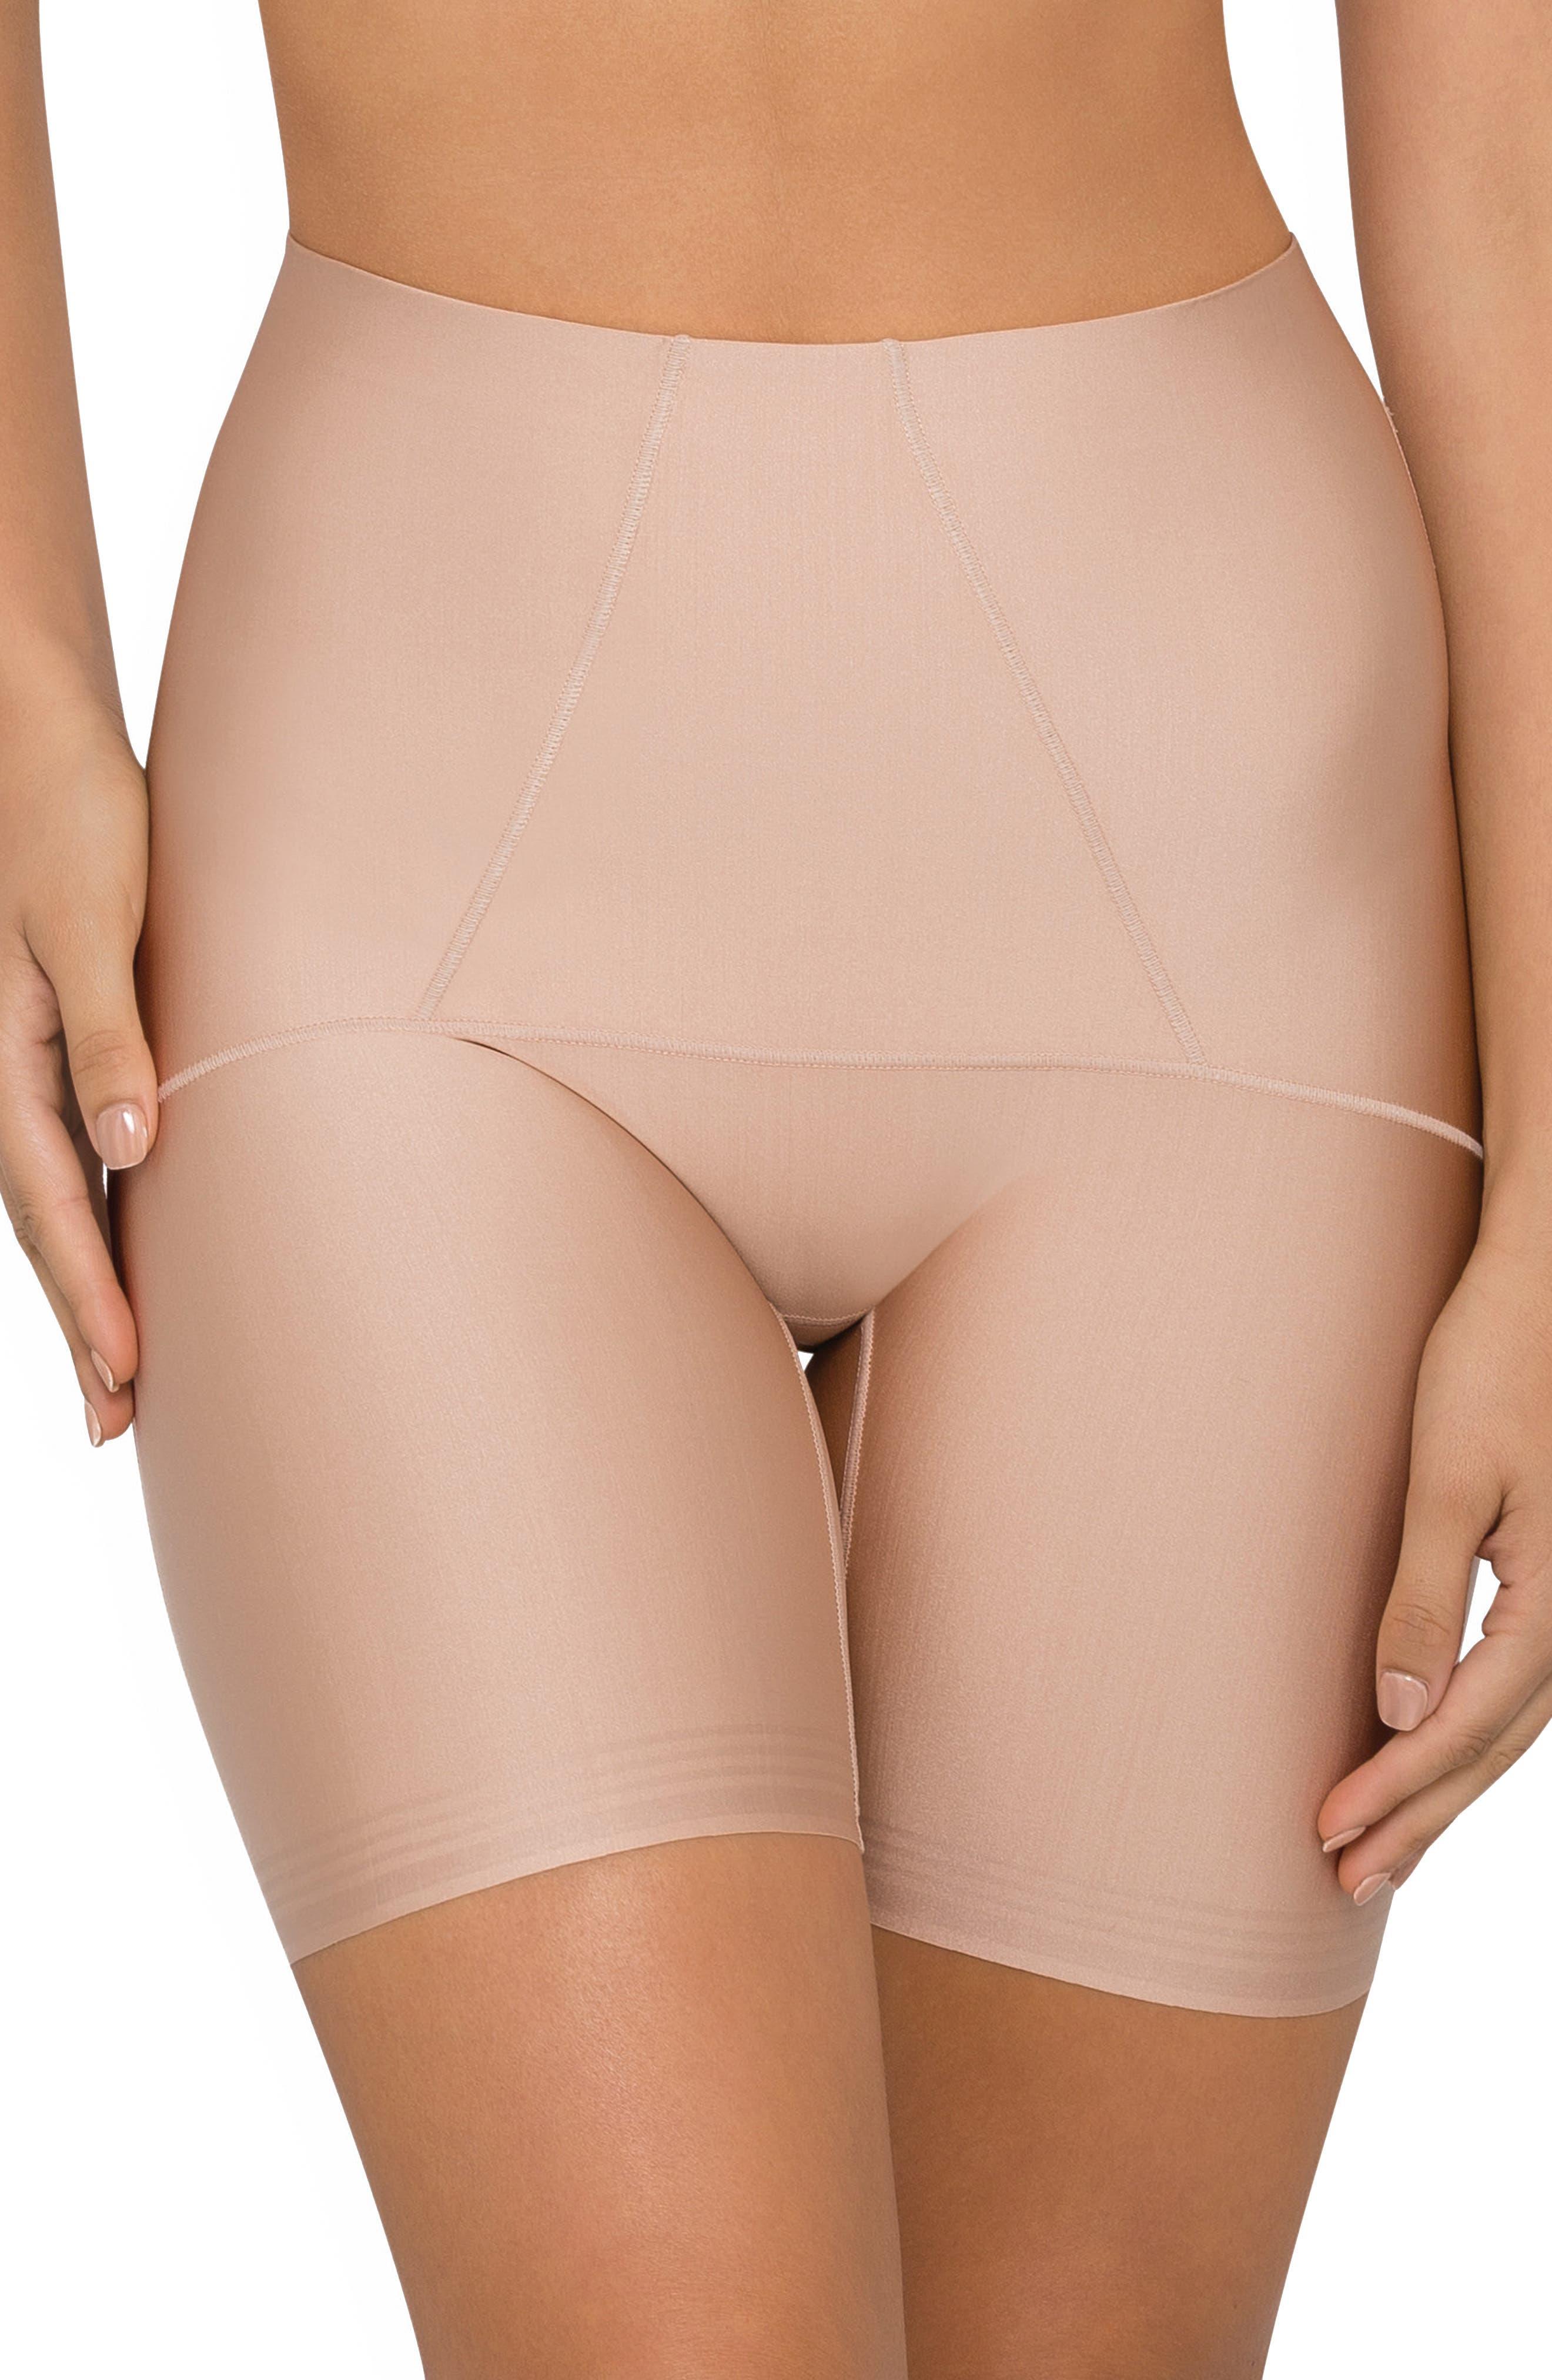 Body Architect High Waist Shaper Shorts,                         Main,                         color, Warm Taupe